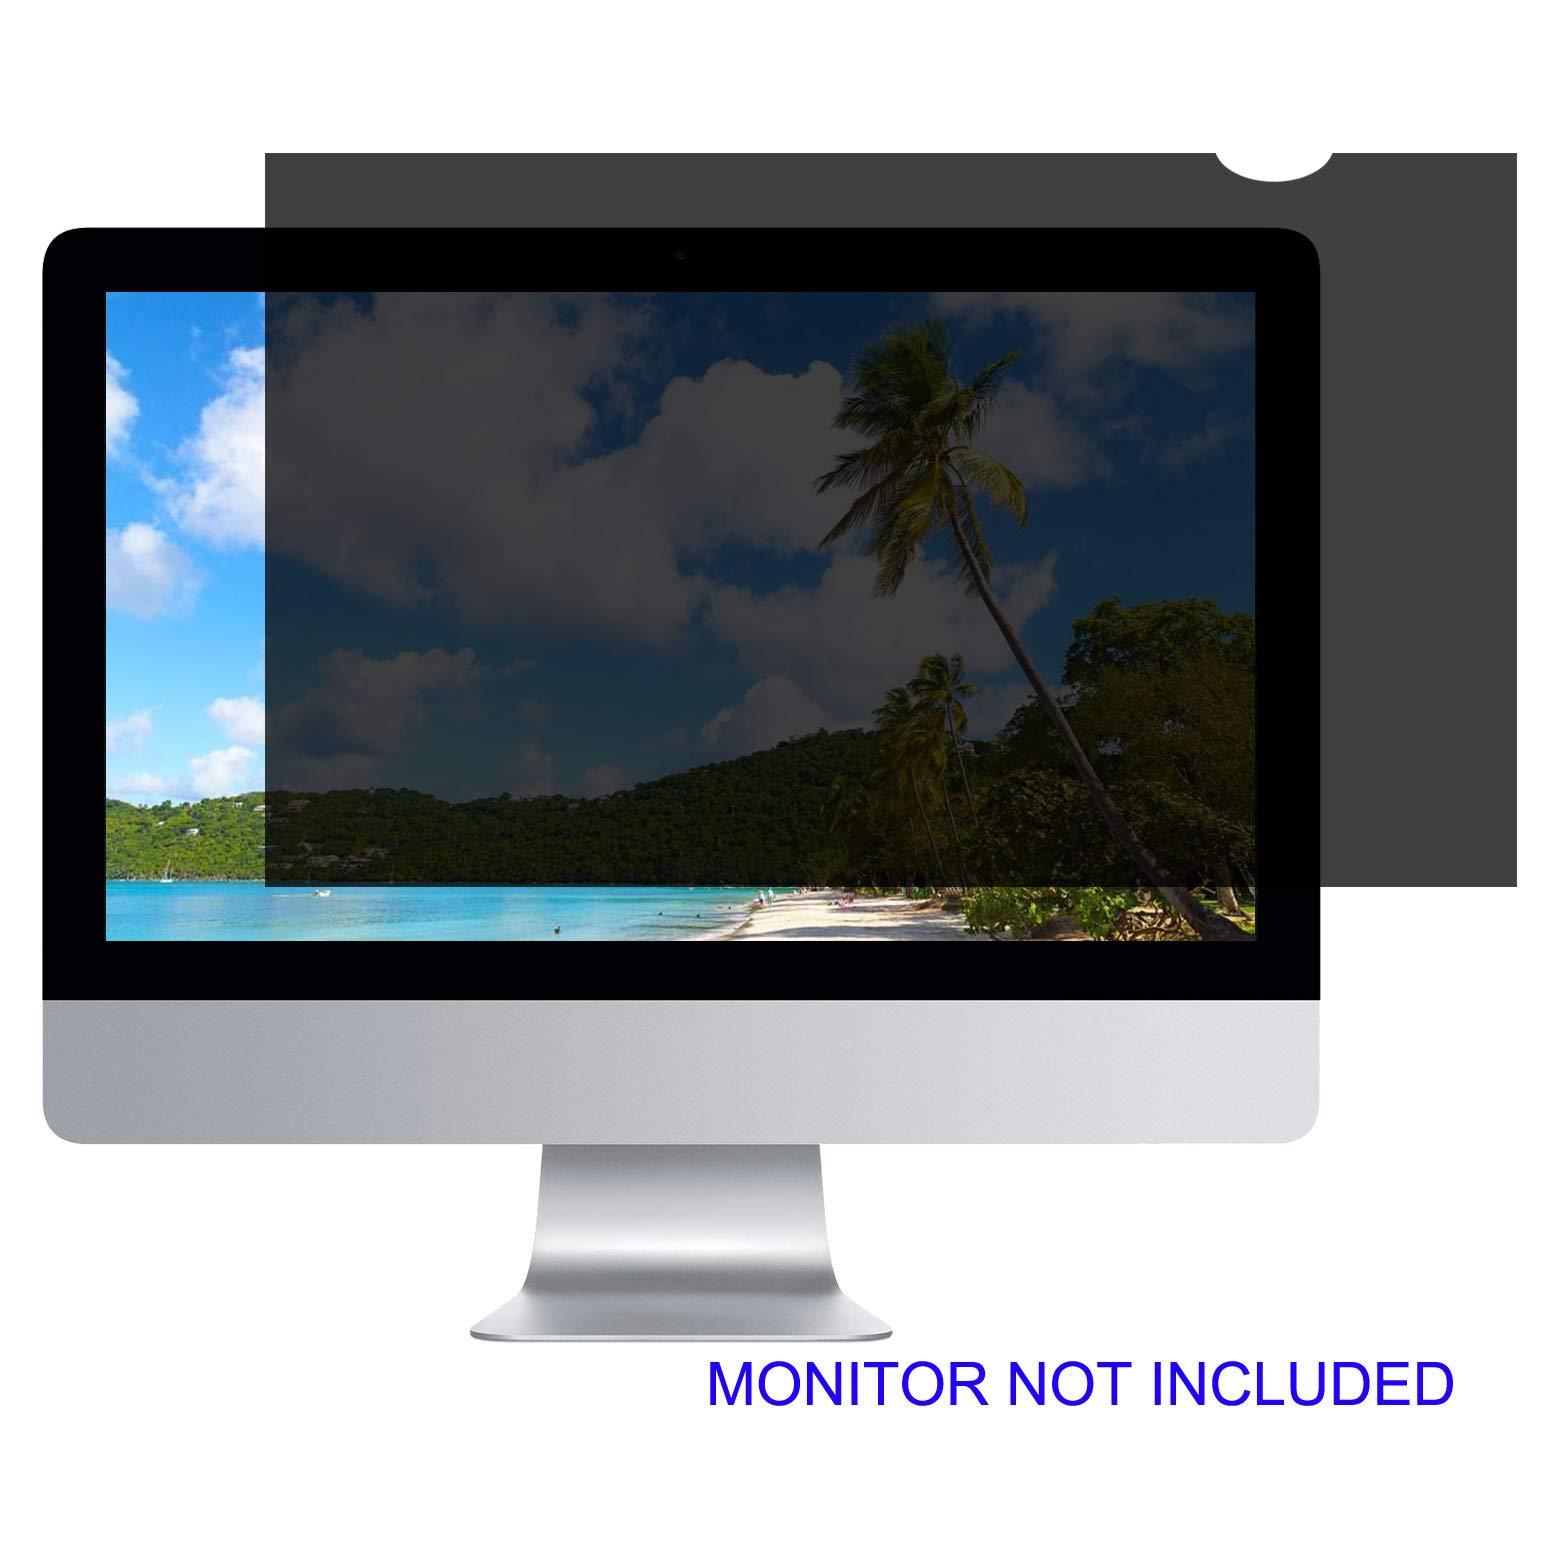 27''W Privacy Screen Filter for Desktop Computer Monitor - Anti-Glare, Blocks 96% UV,Anti-Scratch – Matte or Gloss Finish Privacy Filter Protector - 16:9 (TM27.0W9)